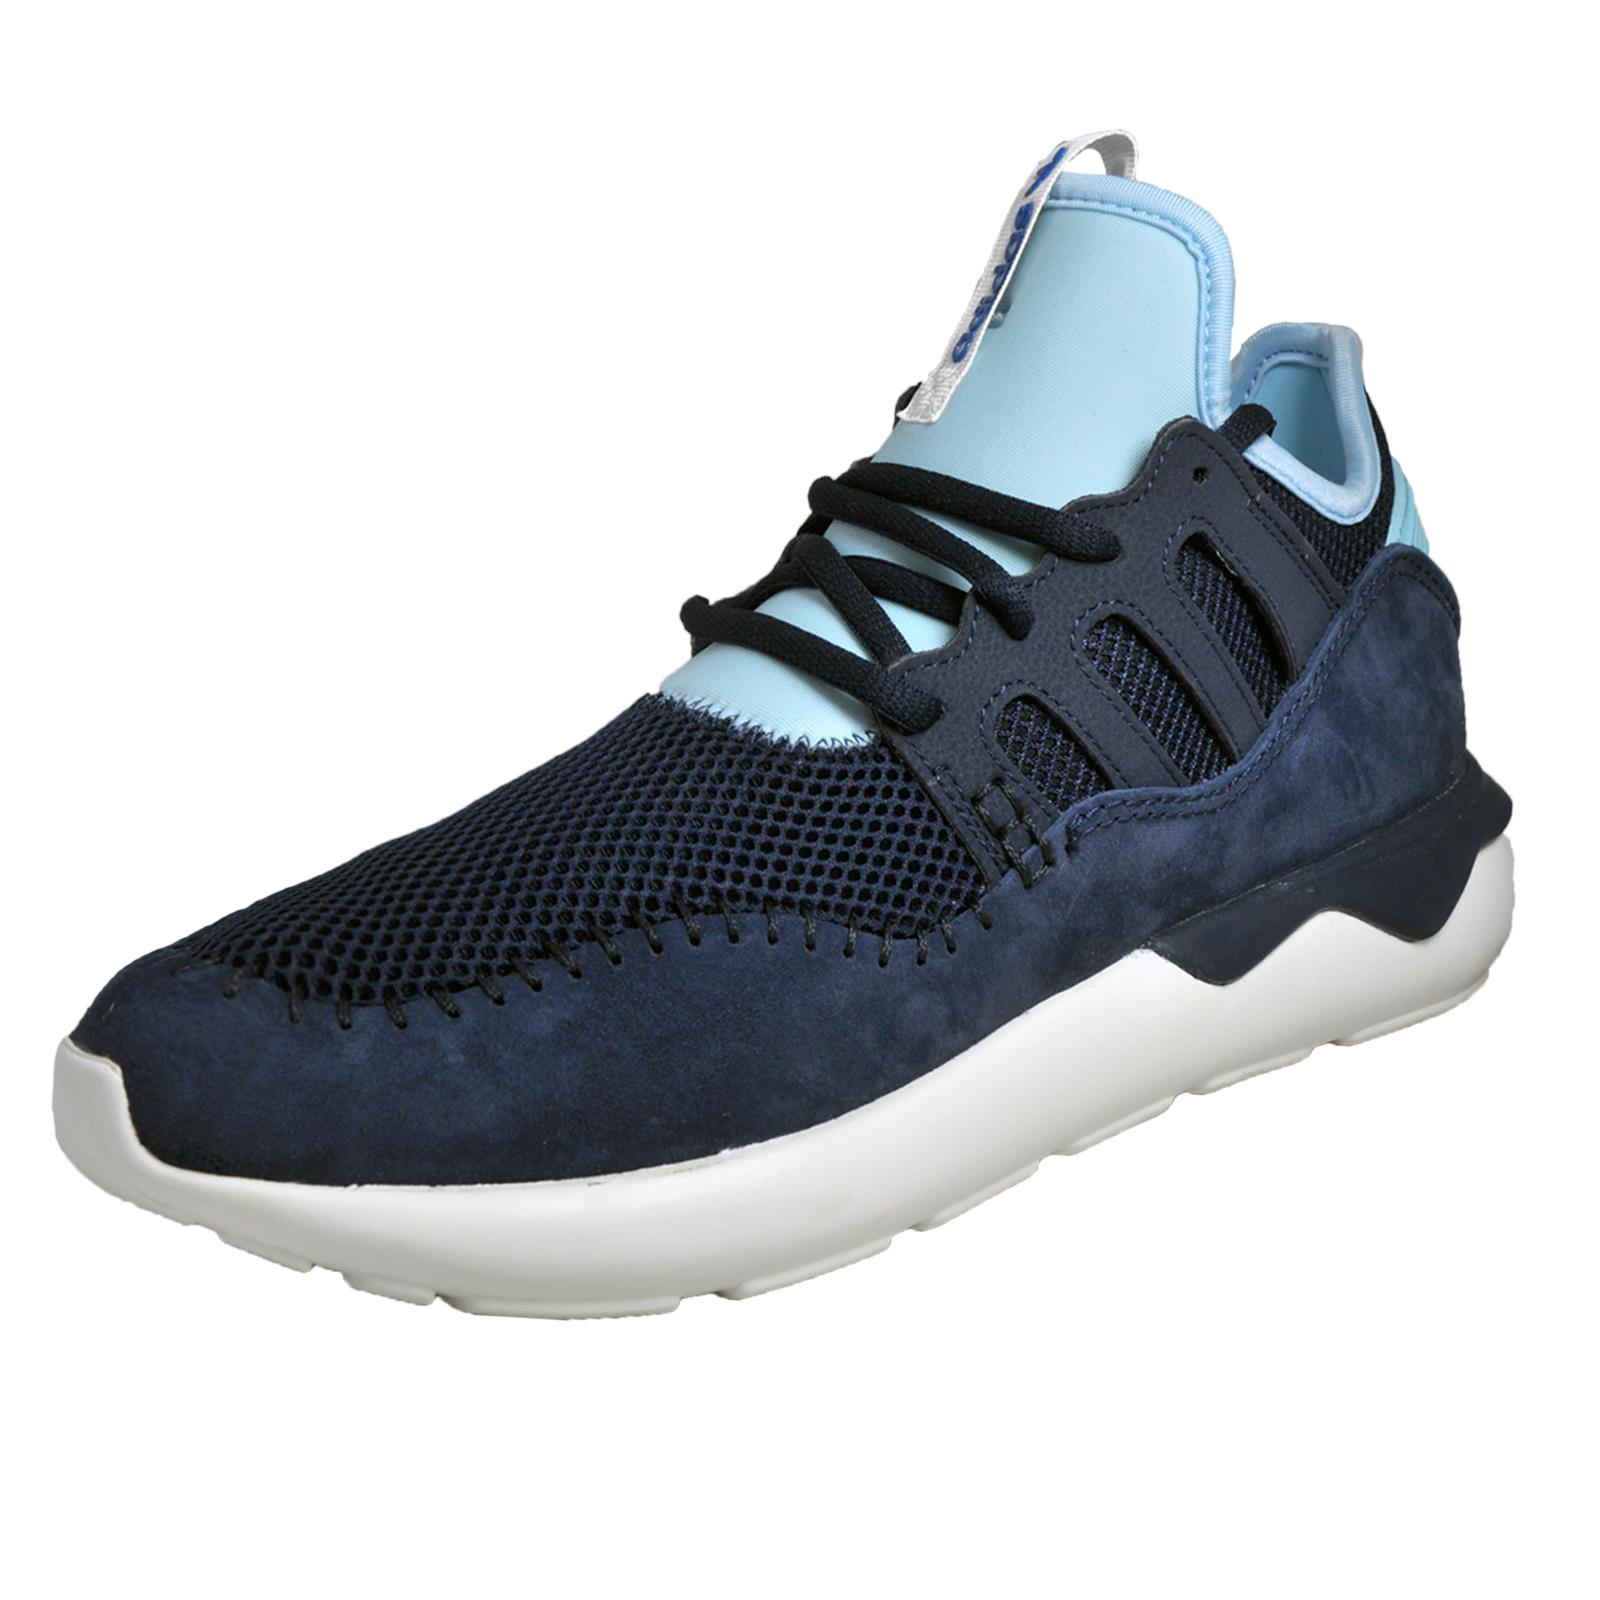 huge discount d98de 4987a Details about Adidas Originals Tubular Moc Runner Mens Gym Running Casual  Trainers Navy